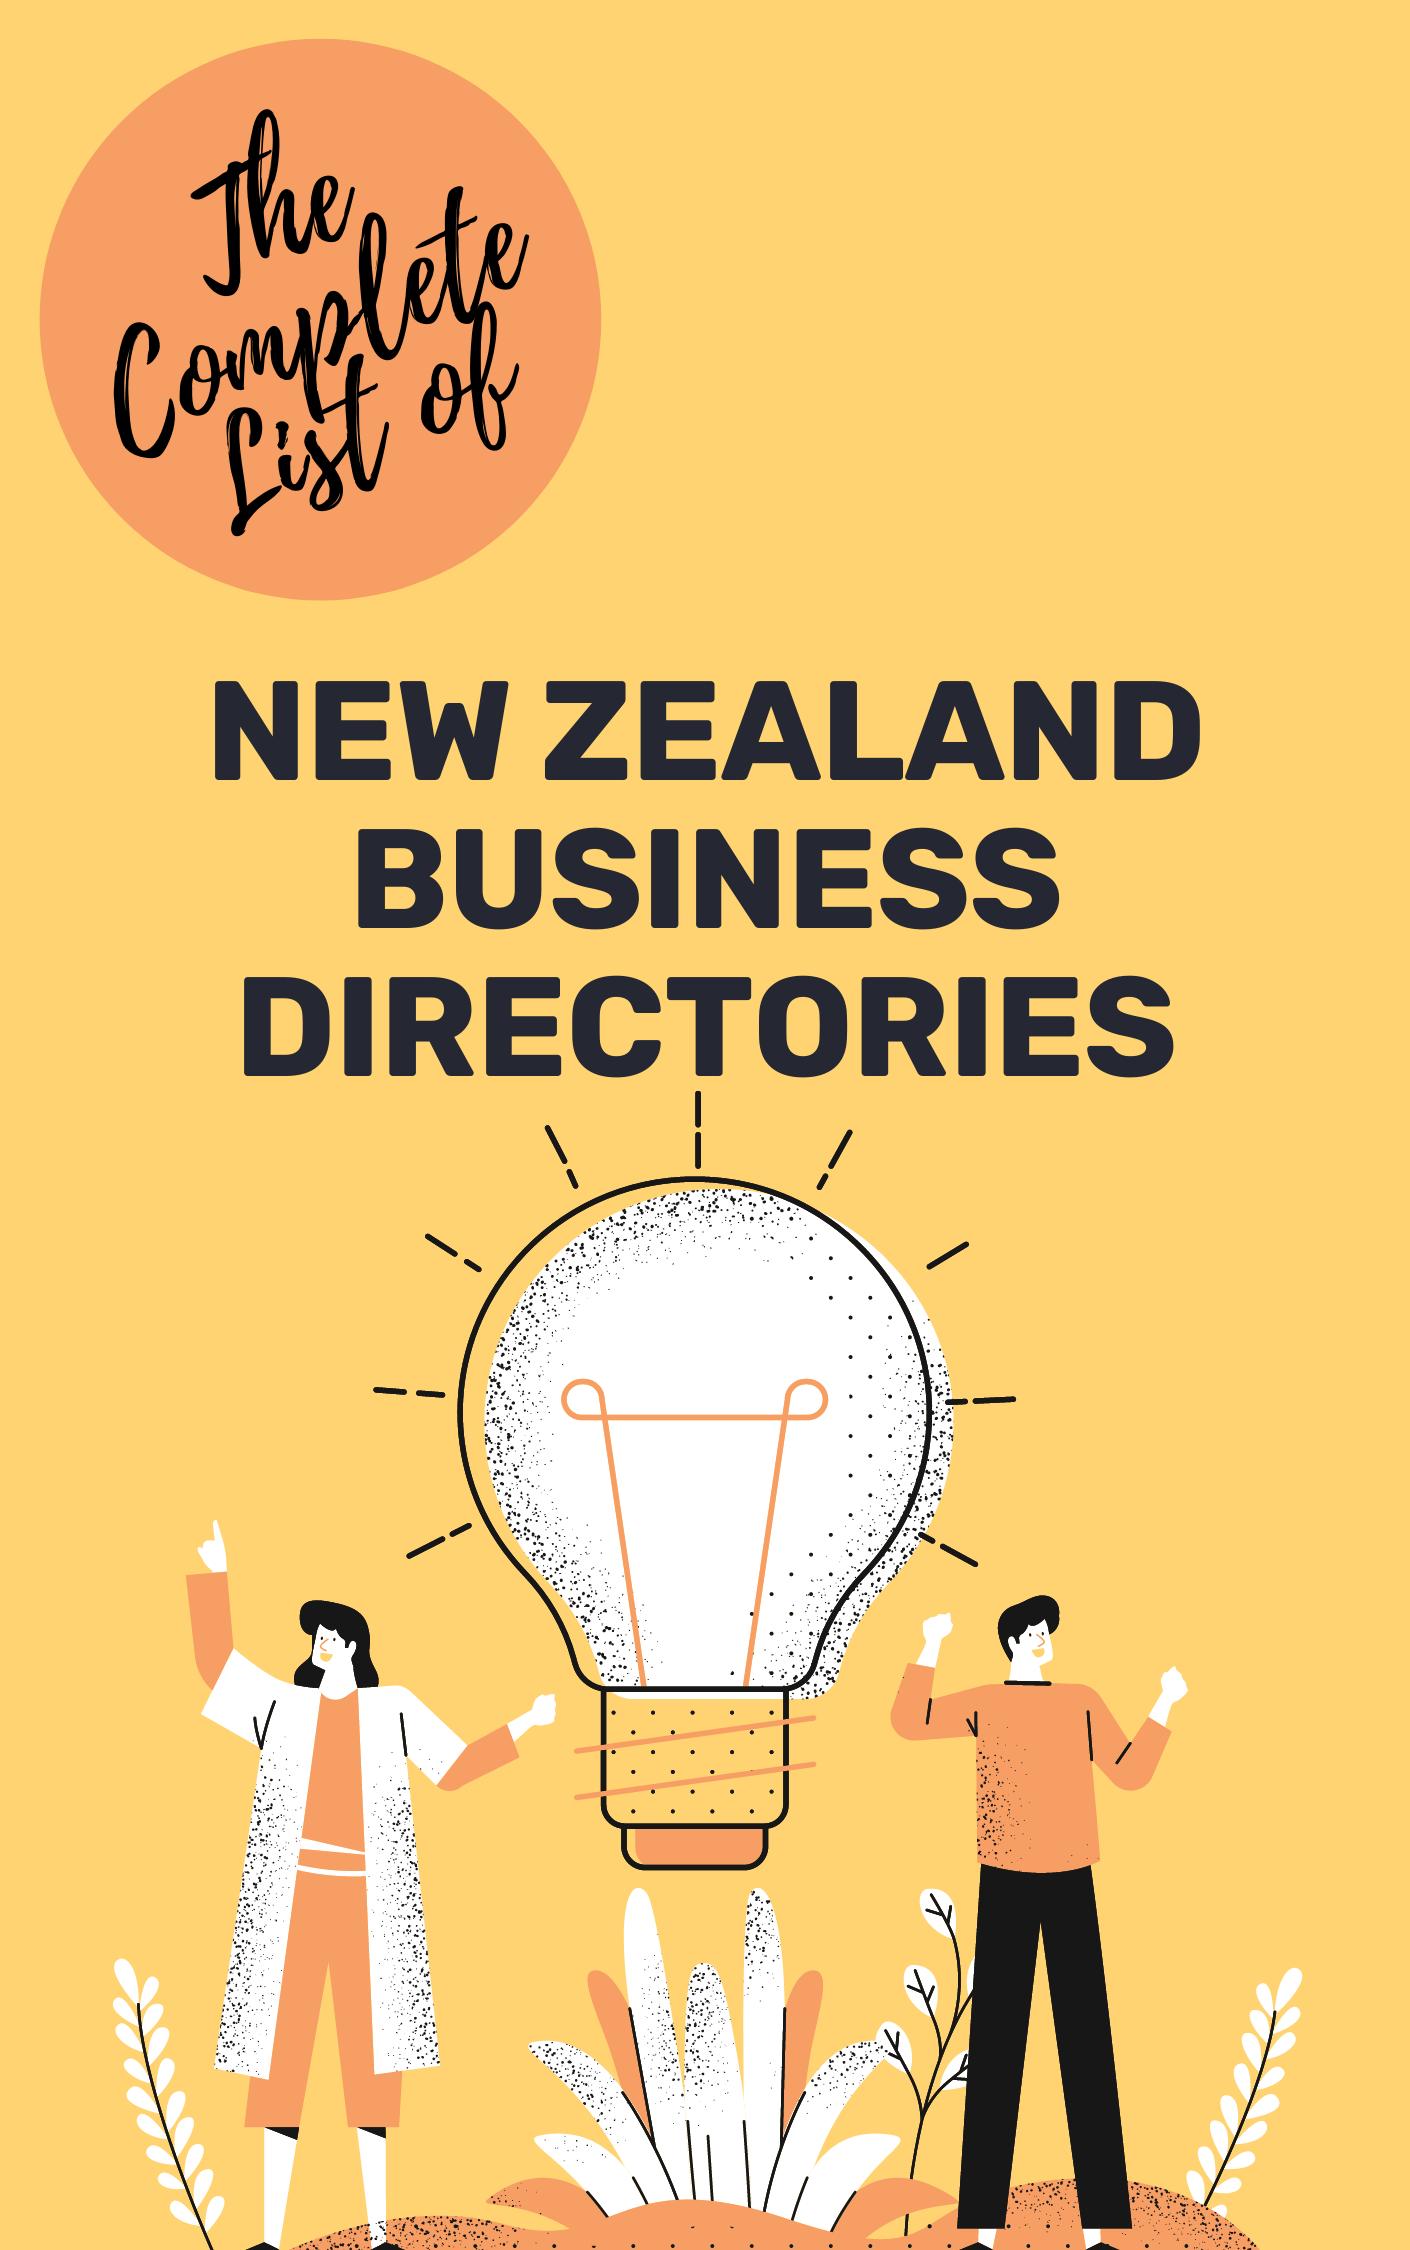 NZ BUSINESS DIRECTORIES DOWNLOAD